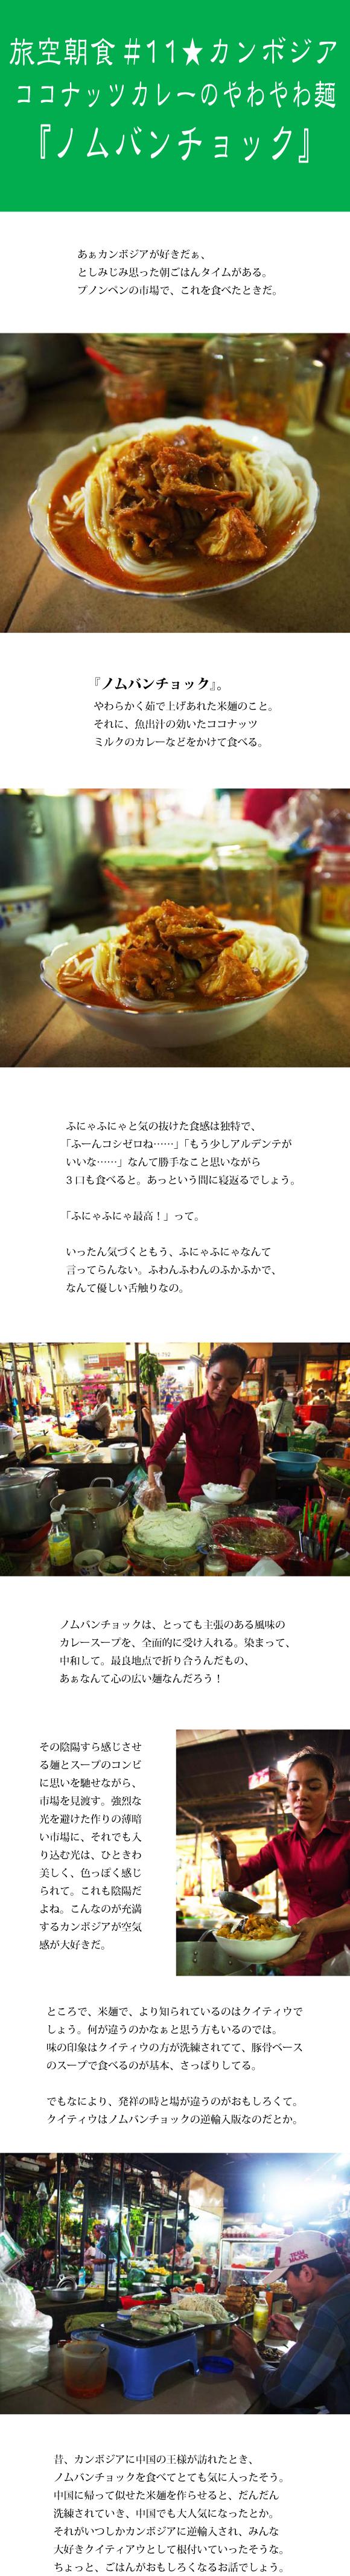 tomako170215.jpg